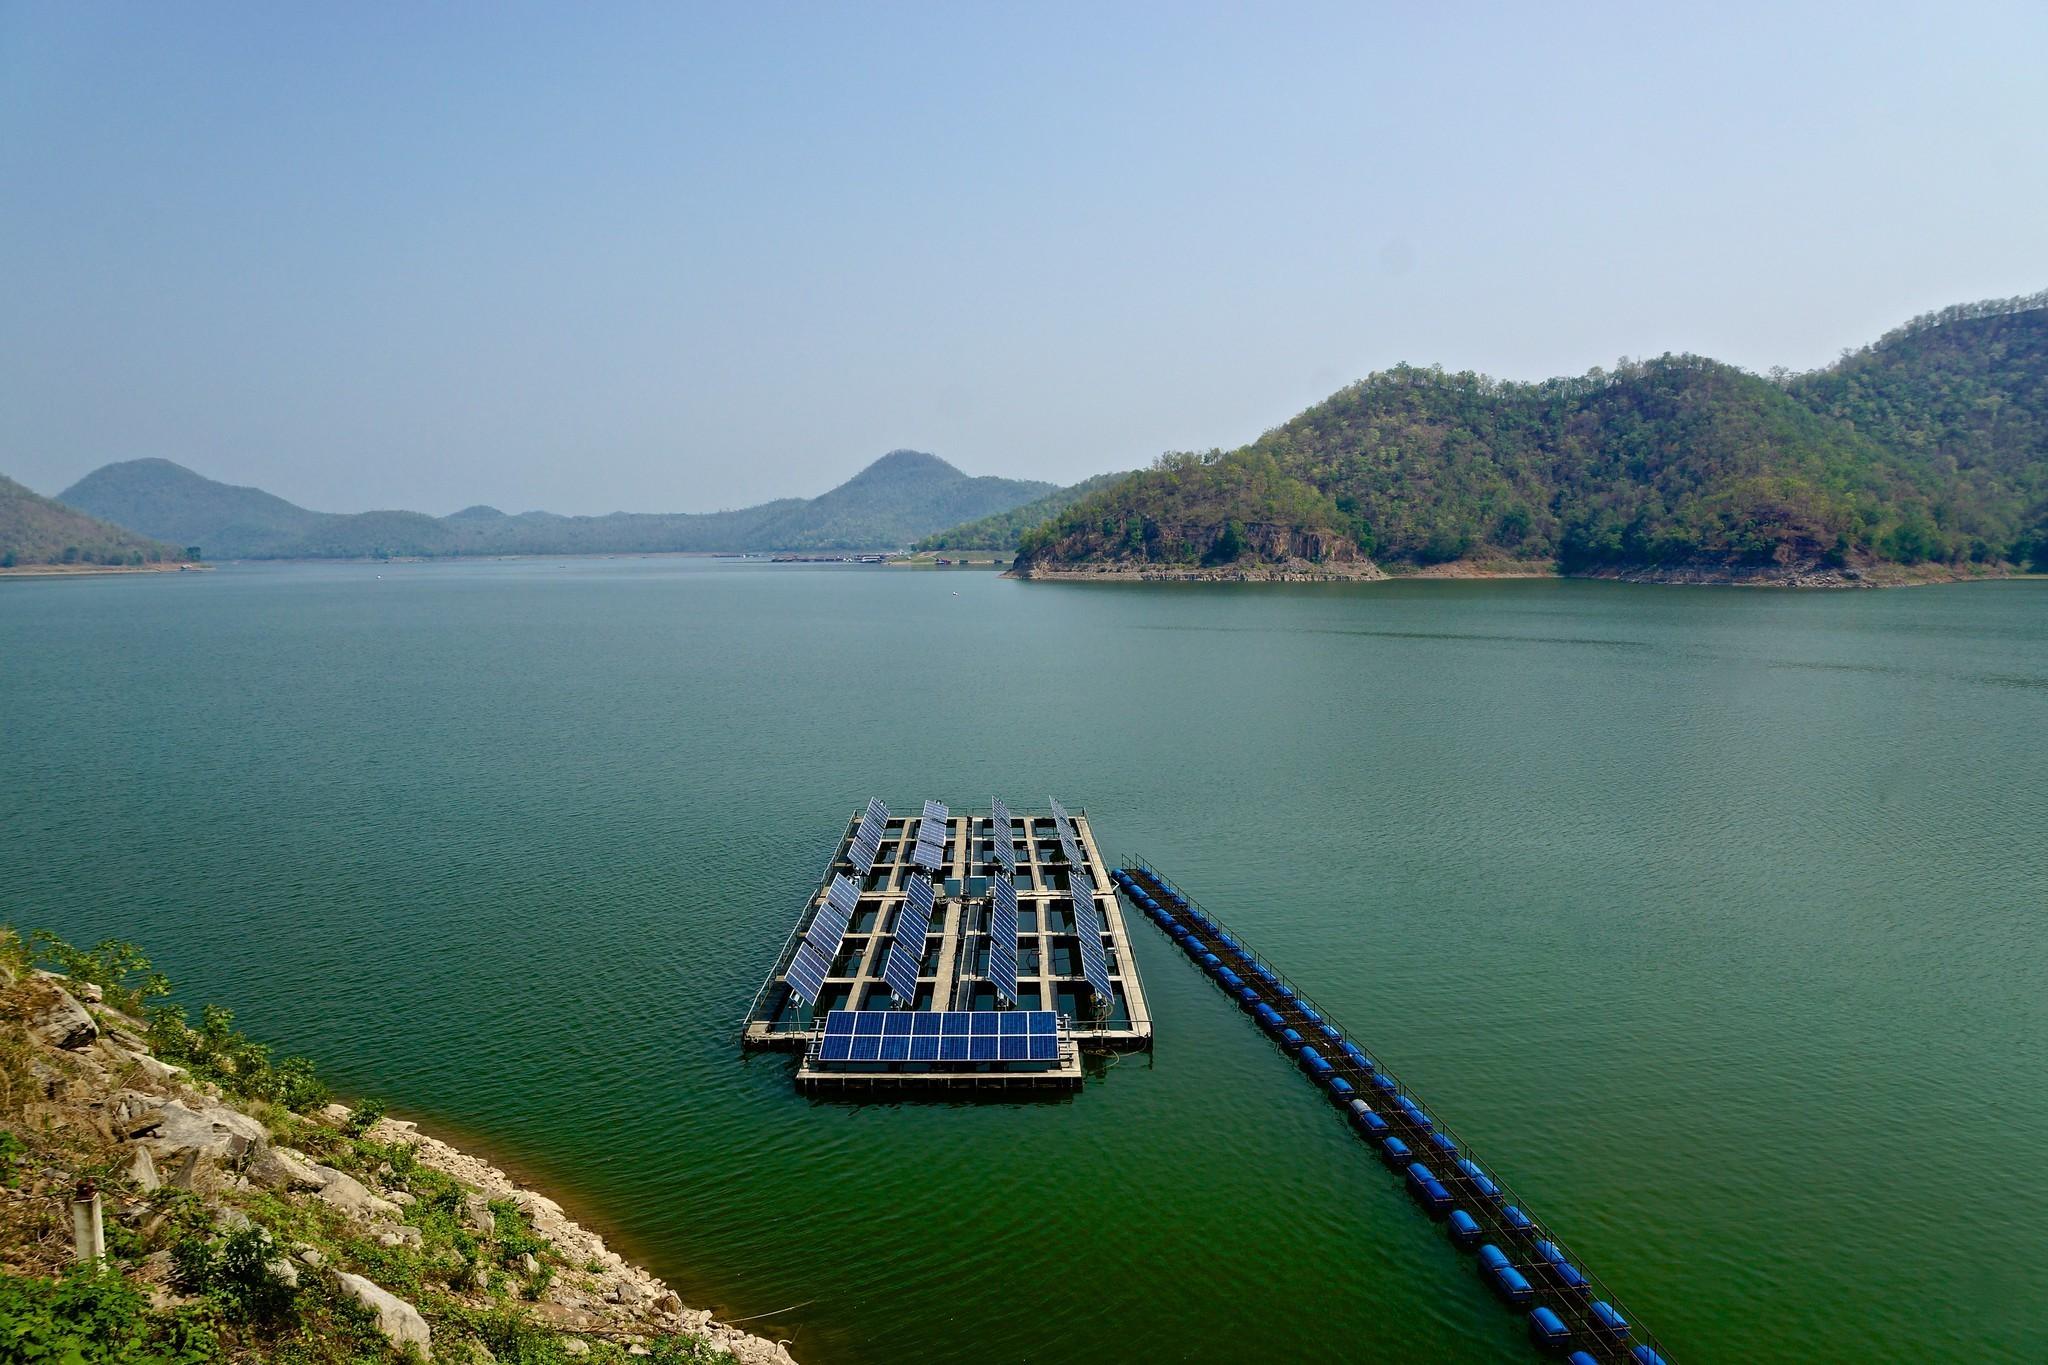 Uwe SchwarzbachFollow Array of solar panels on Srinakarin lake near the dam in Kanchanaburi province, Thailand brucecarlson66, ANNE LOTTE and 46 m